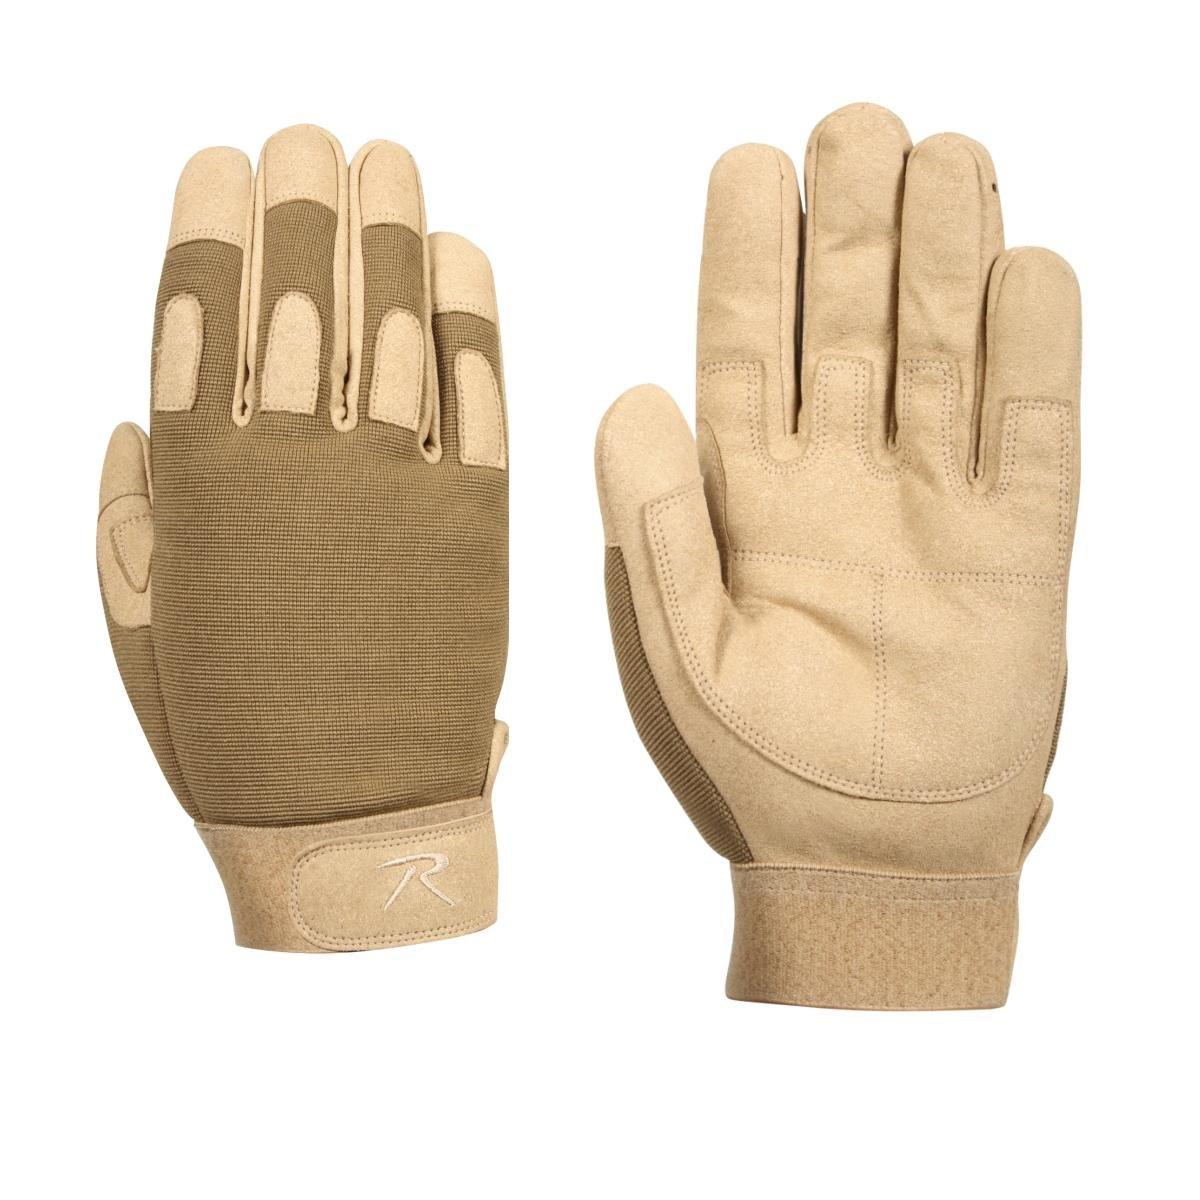 Rothco L/W All Purpose Duty Gloves, Coyote, Medium